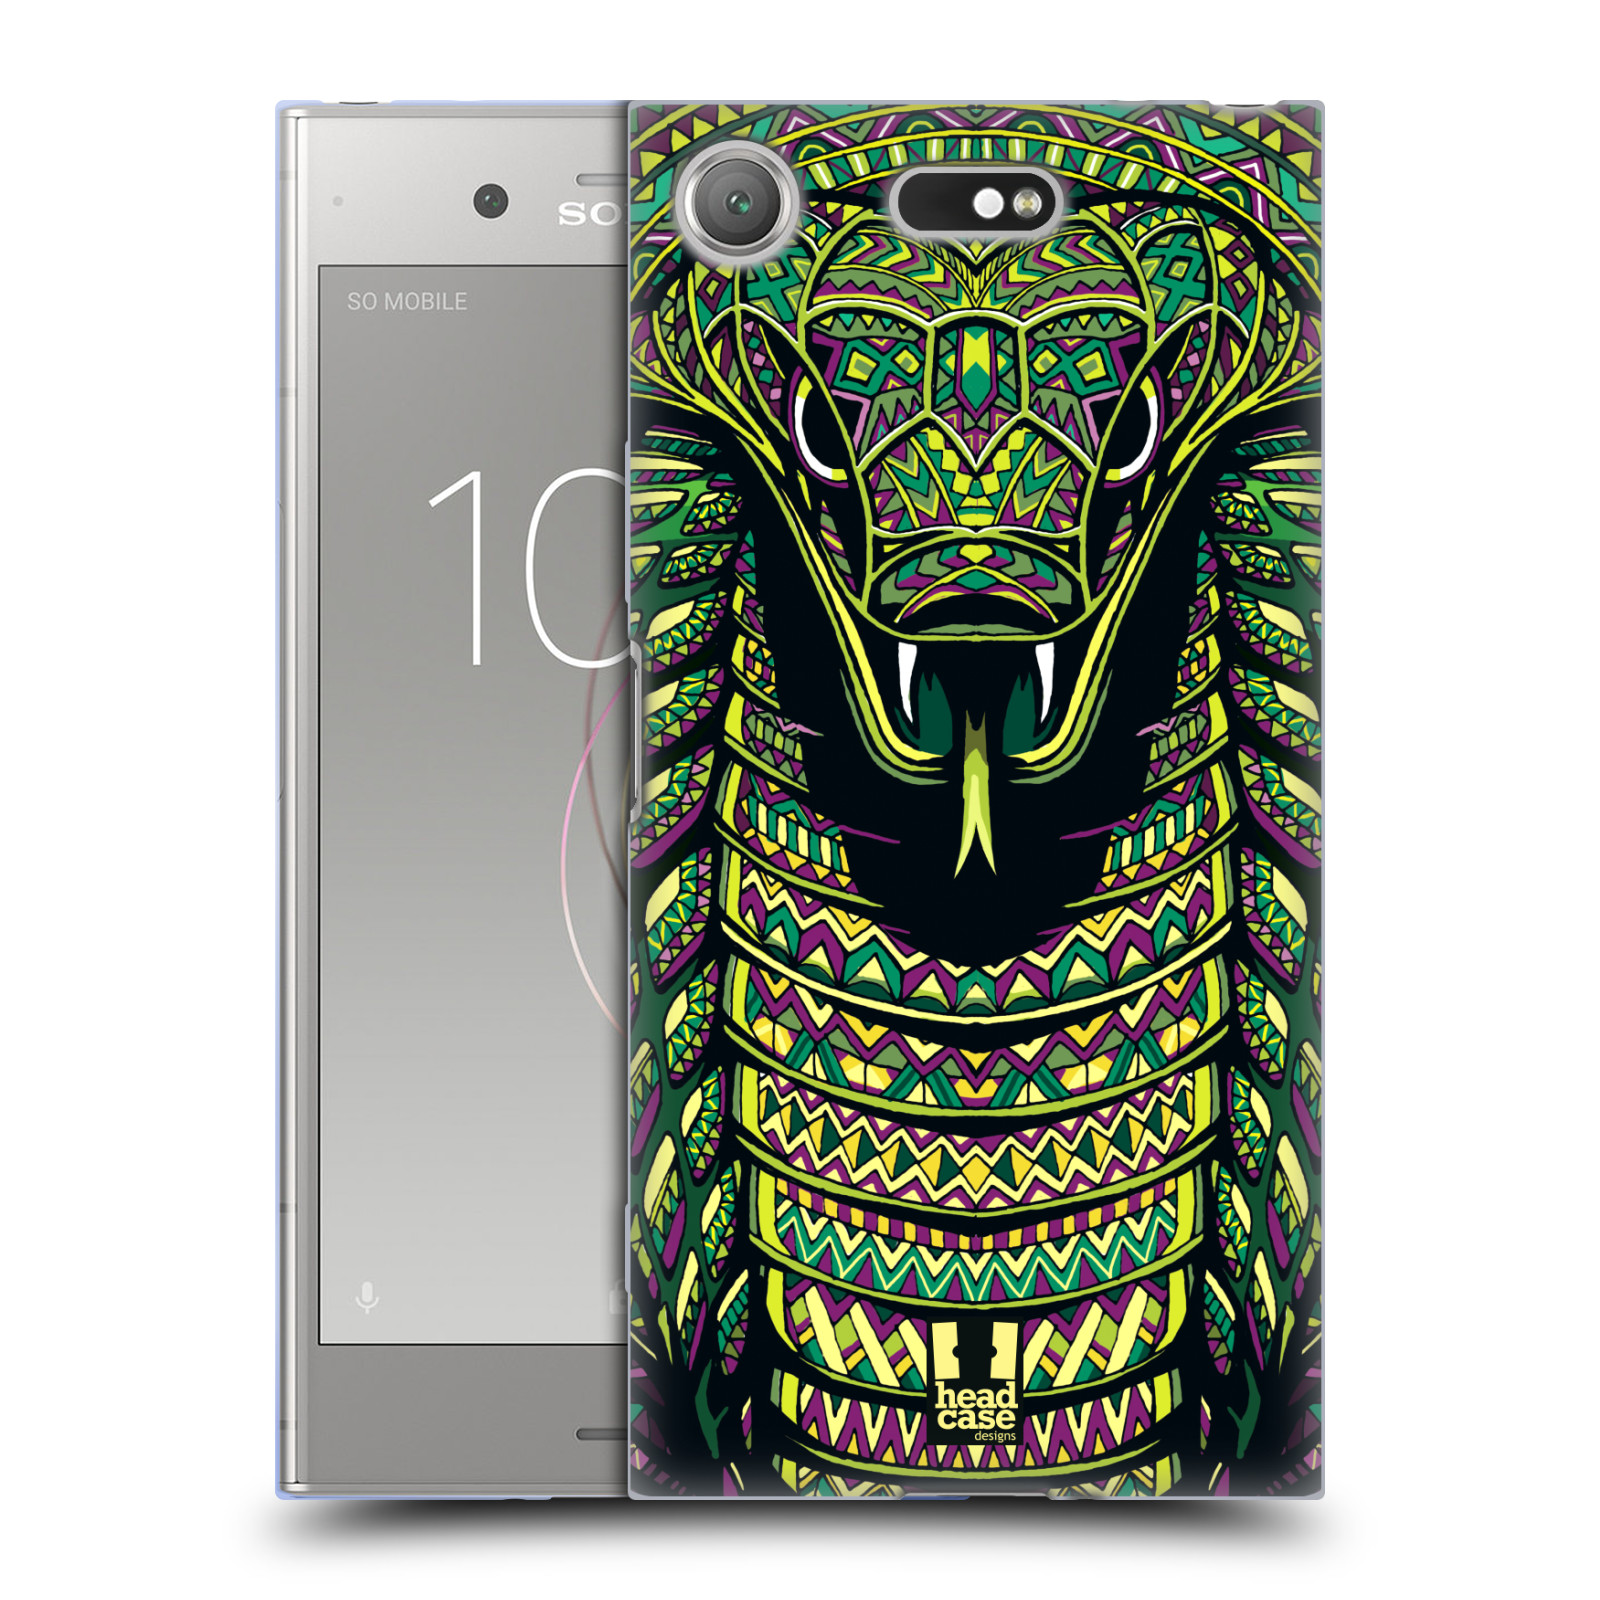 Silikonové pouzdro na mobil Sony Xperia XZ1 Compact - Head Case - AZTEC HAD